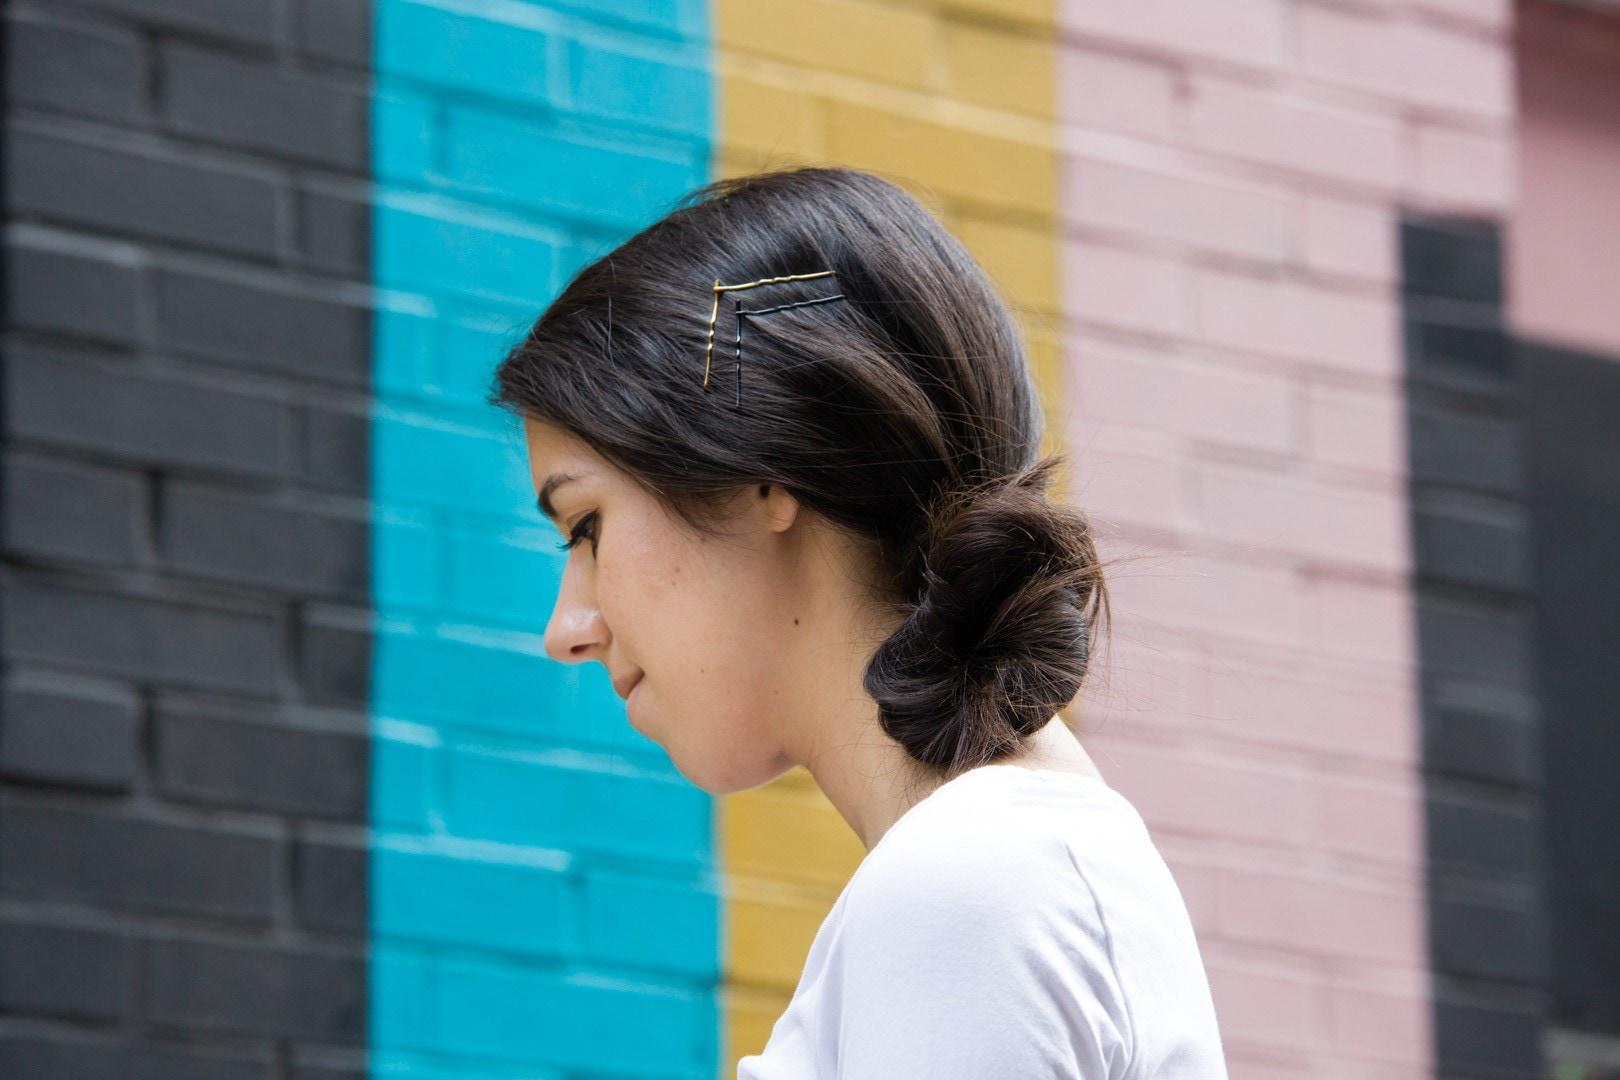 Wanita kaukasia dengan model rambut side bun menghadap ke samping